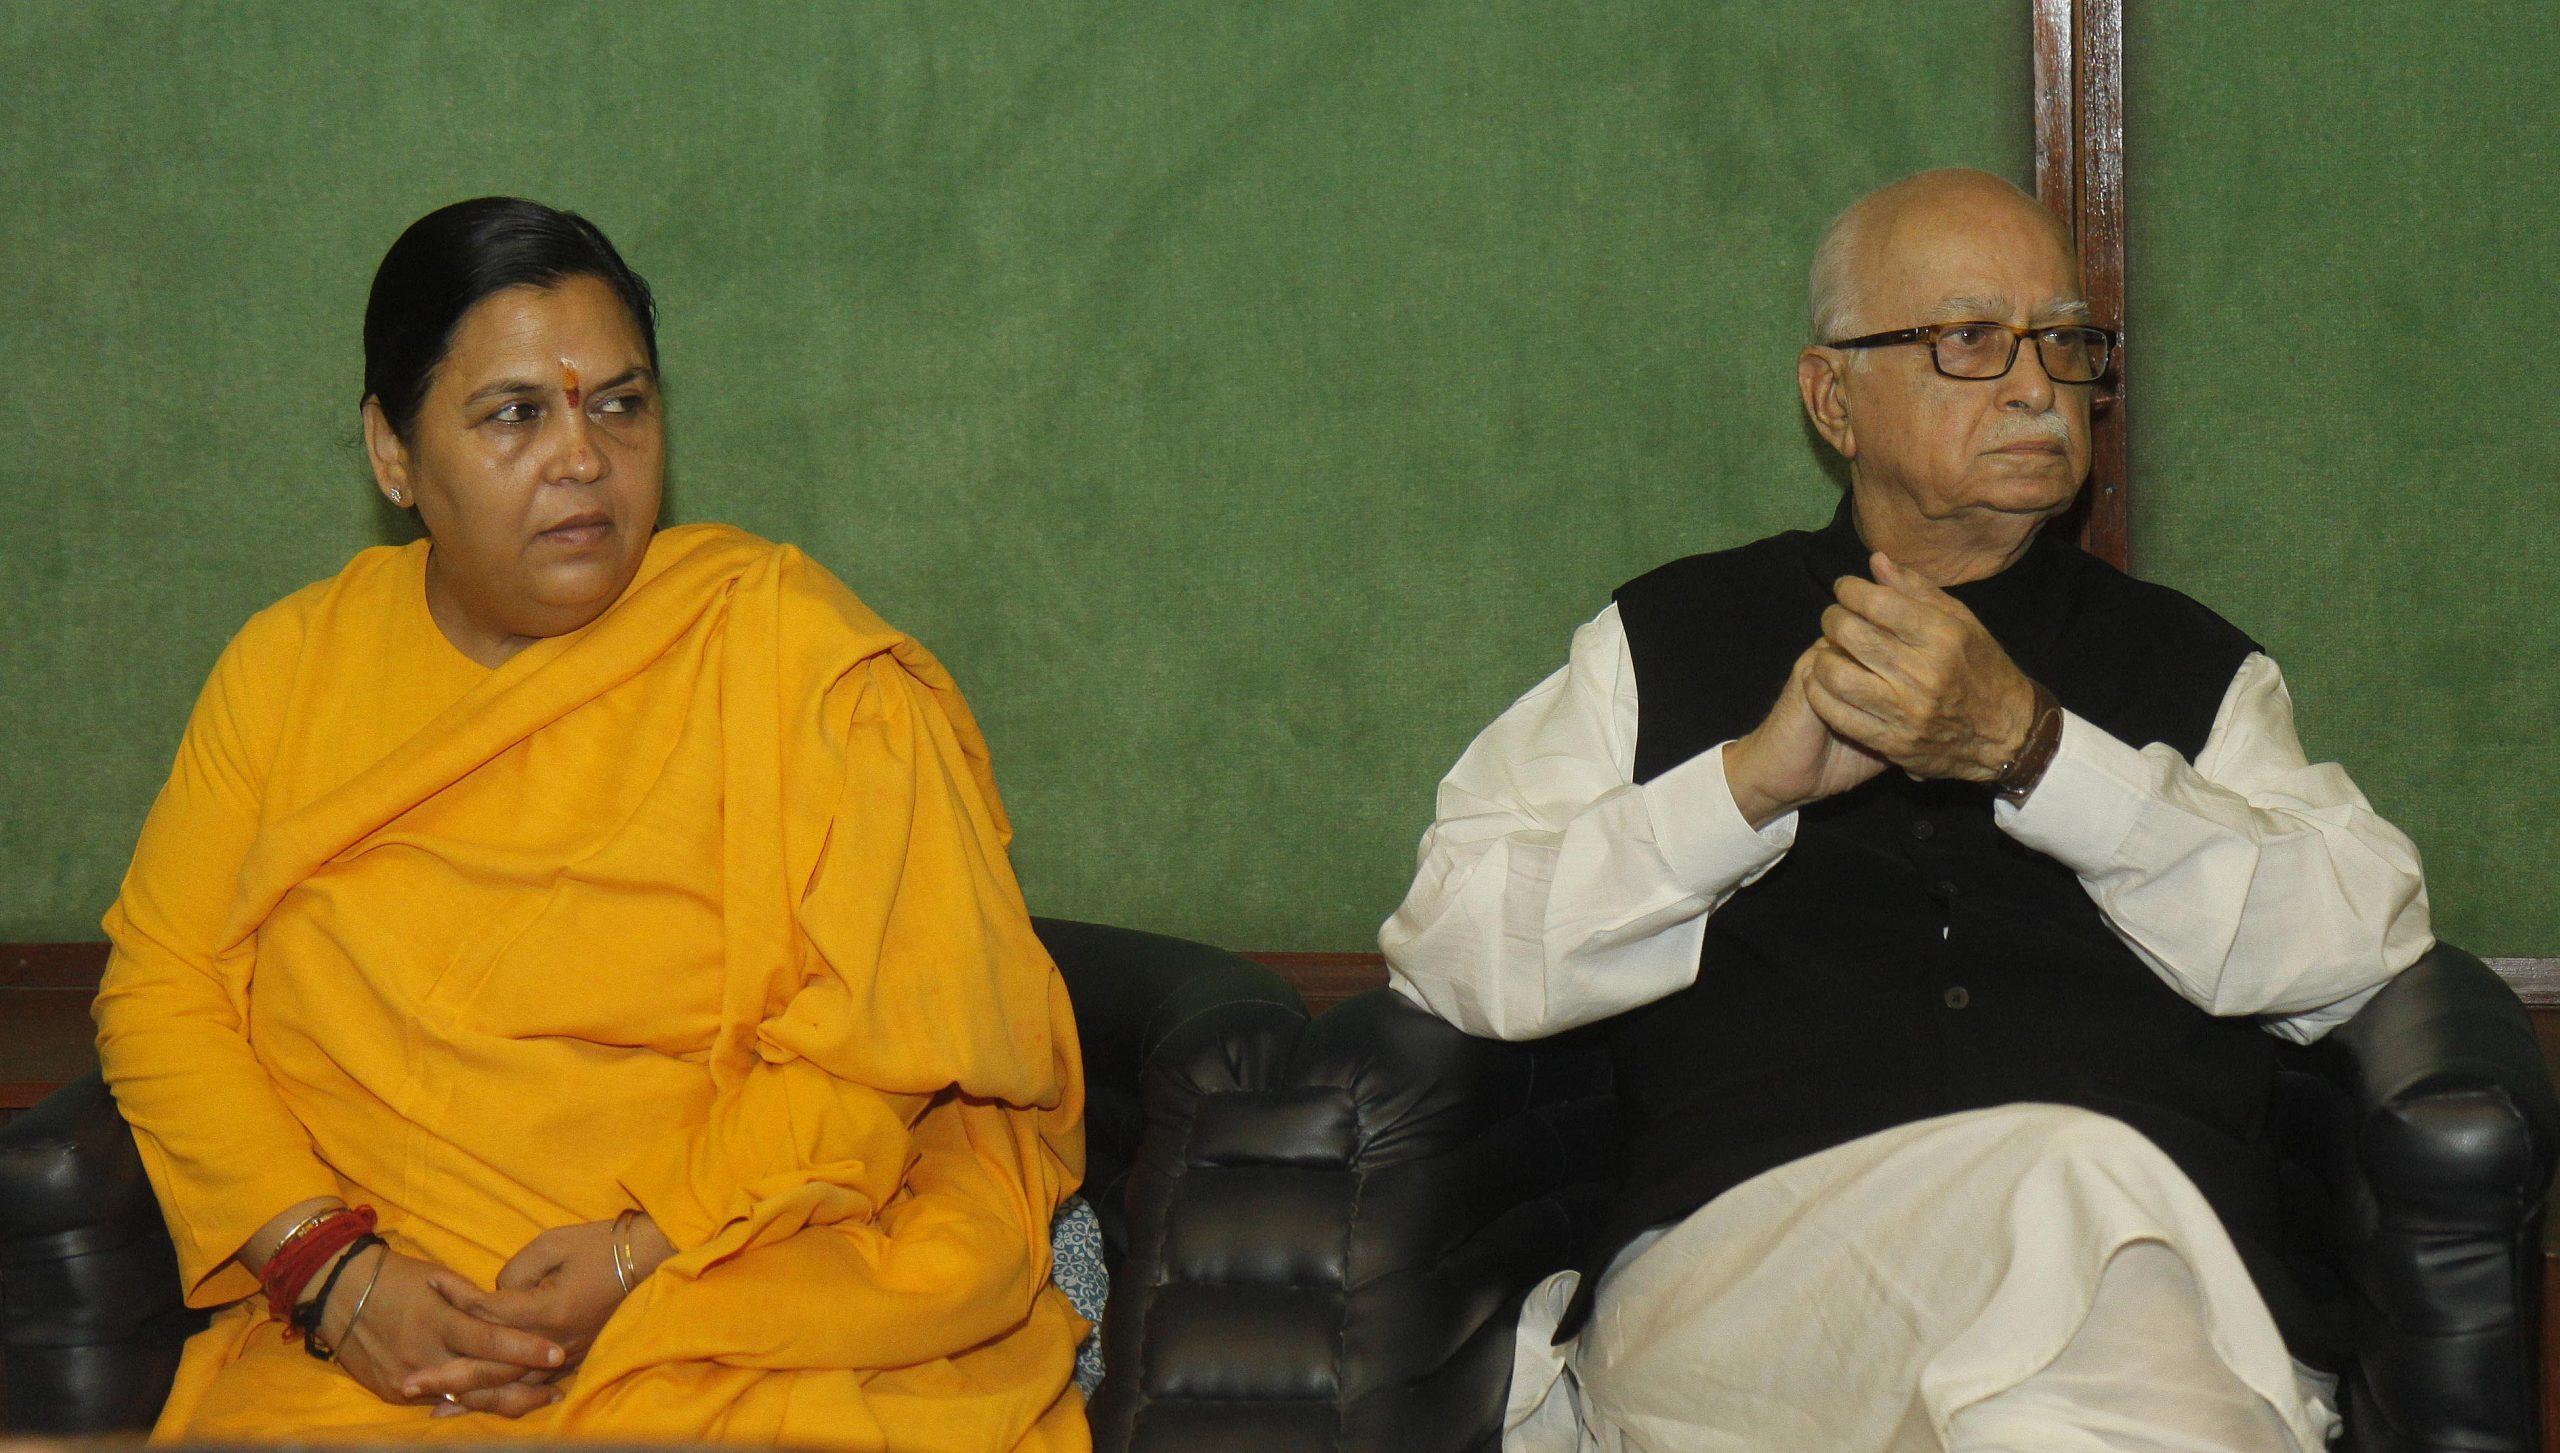 BJP leaders L K Advani and Uma Bharti